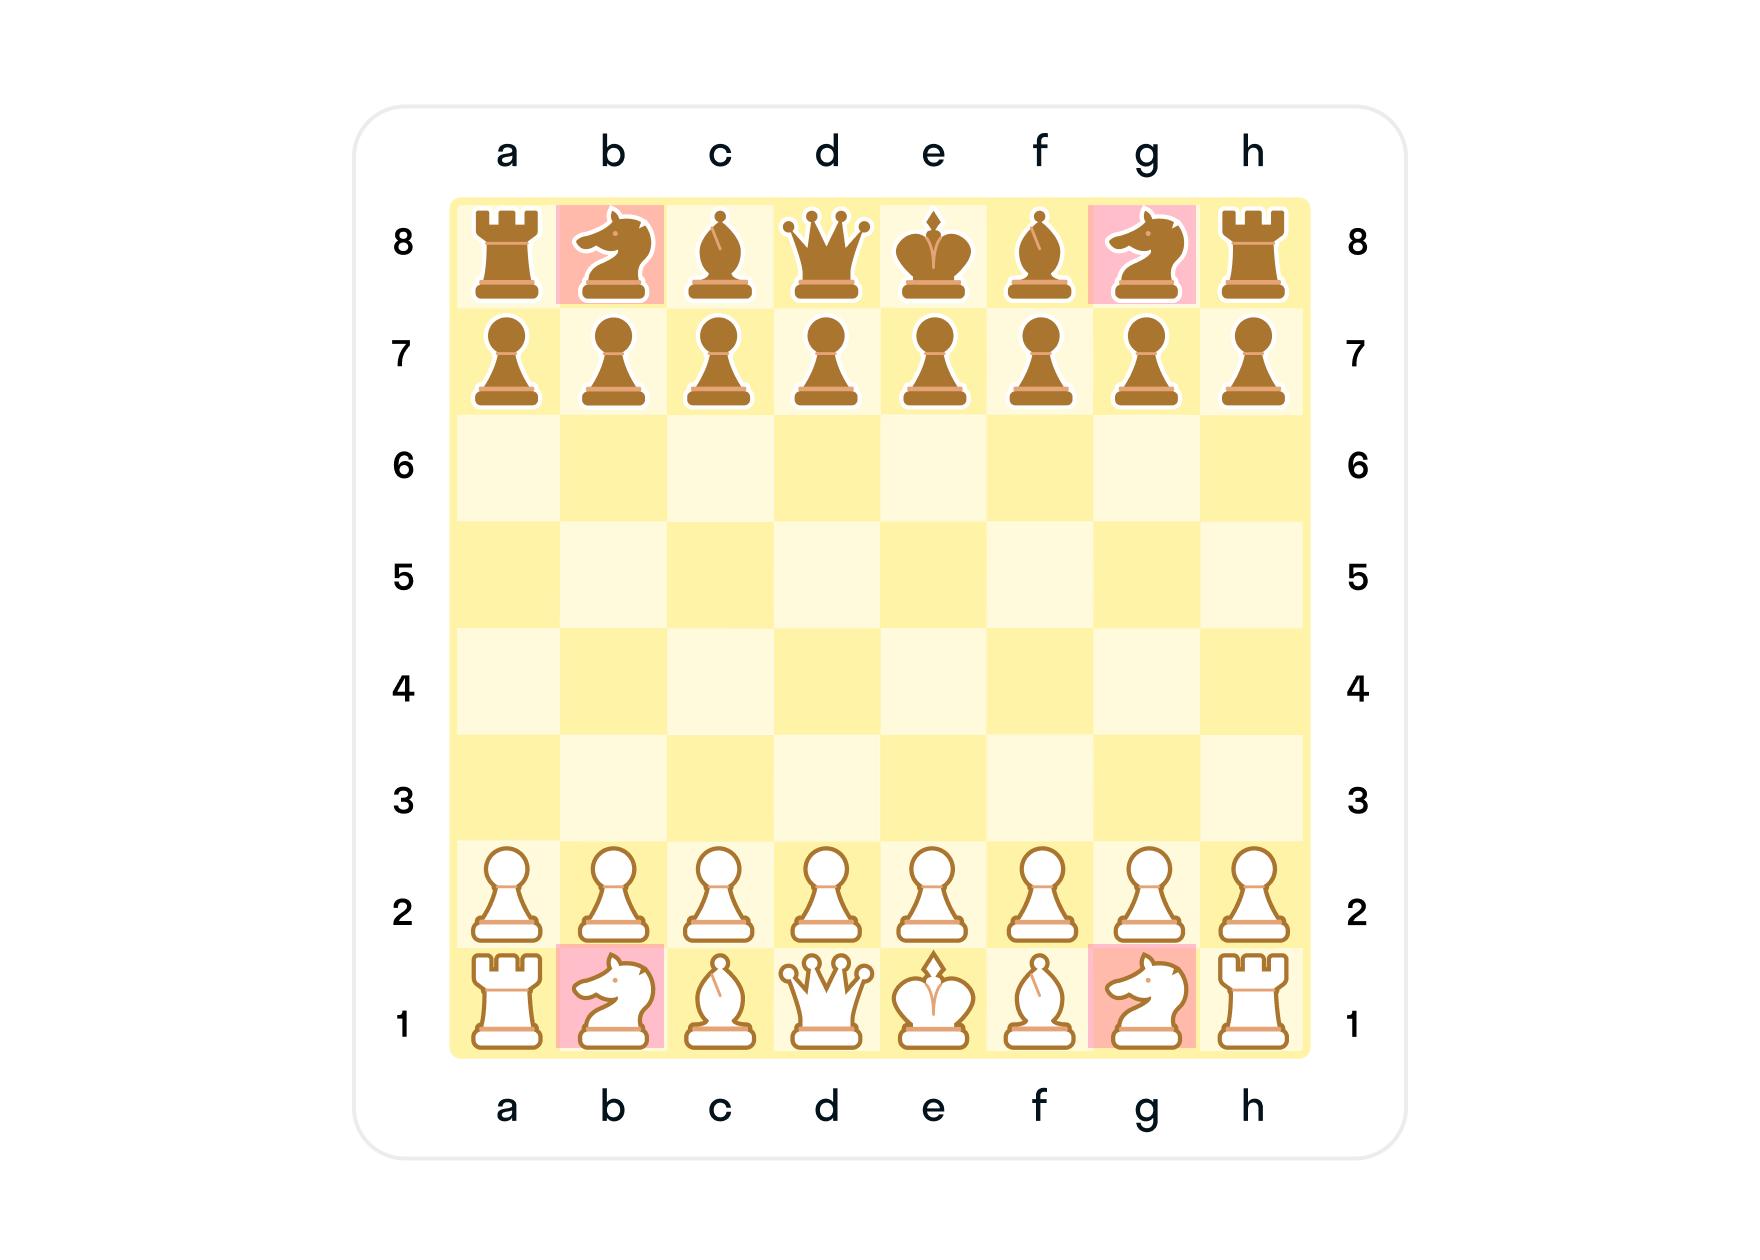 Где на шахматной доске стоят кони